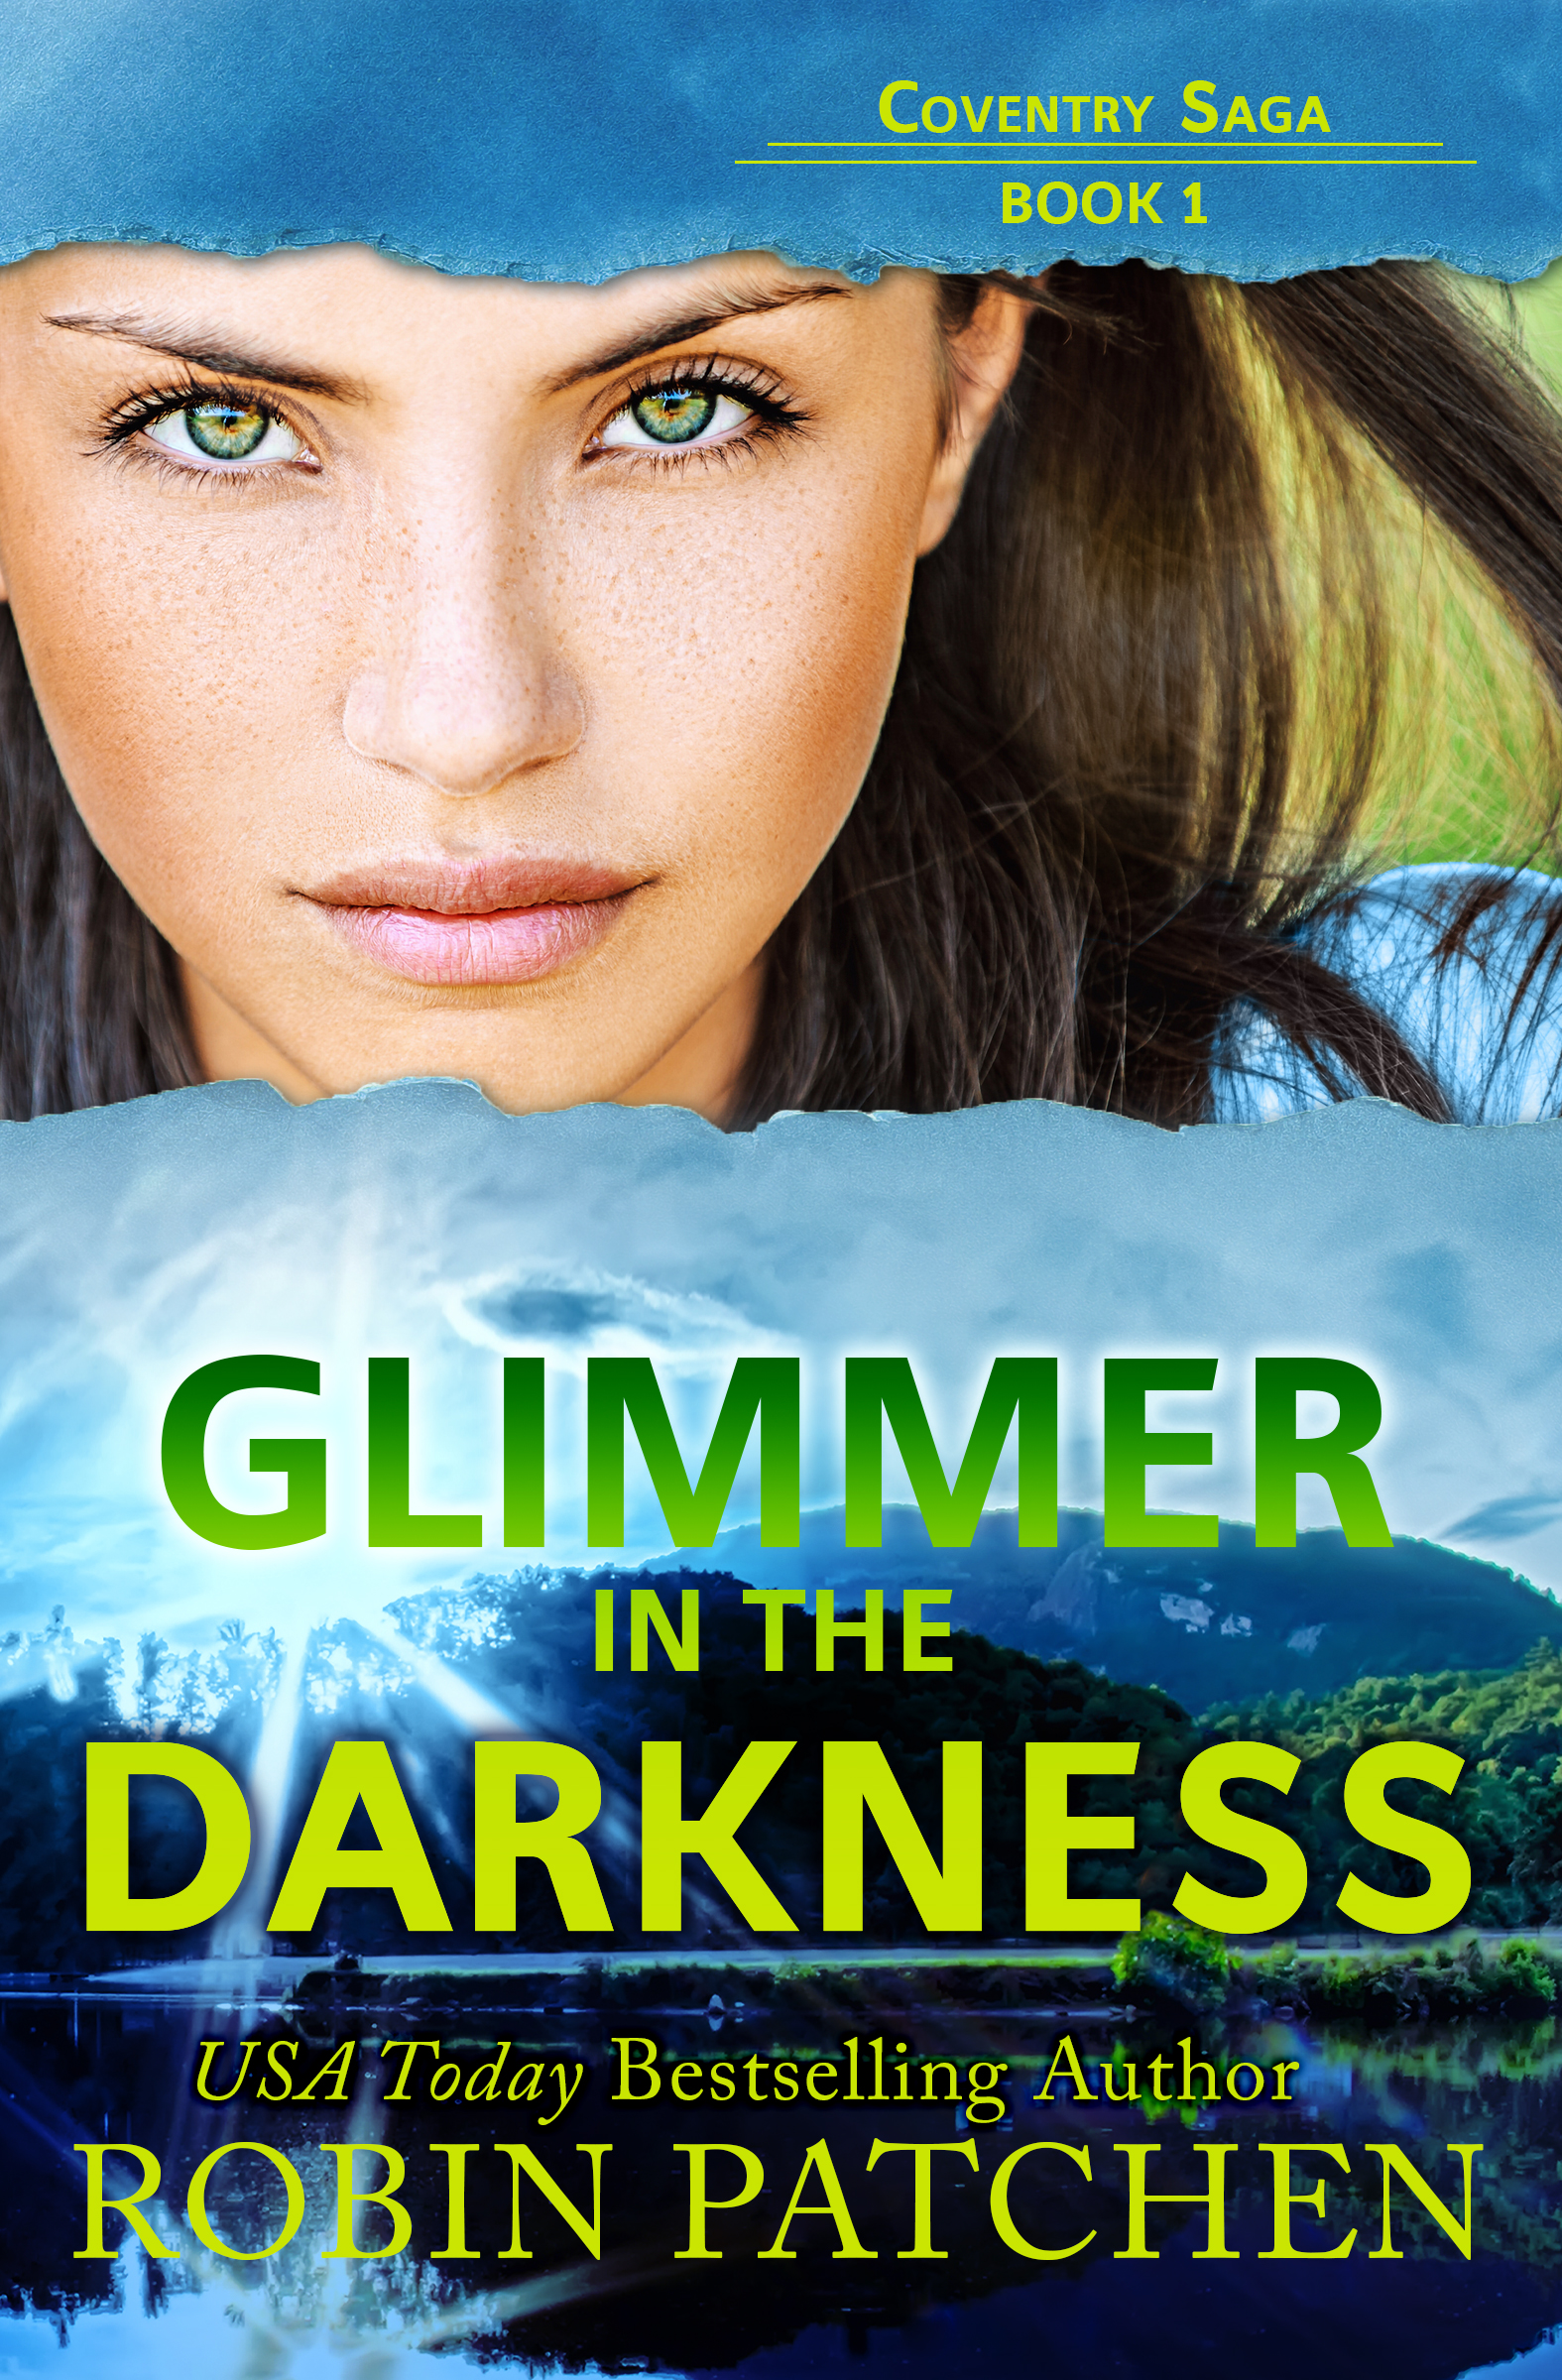 Glimmer-USAT.jpg